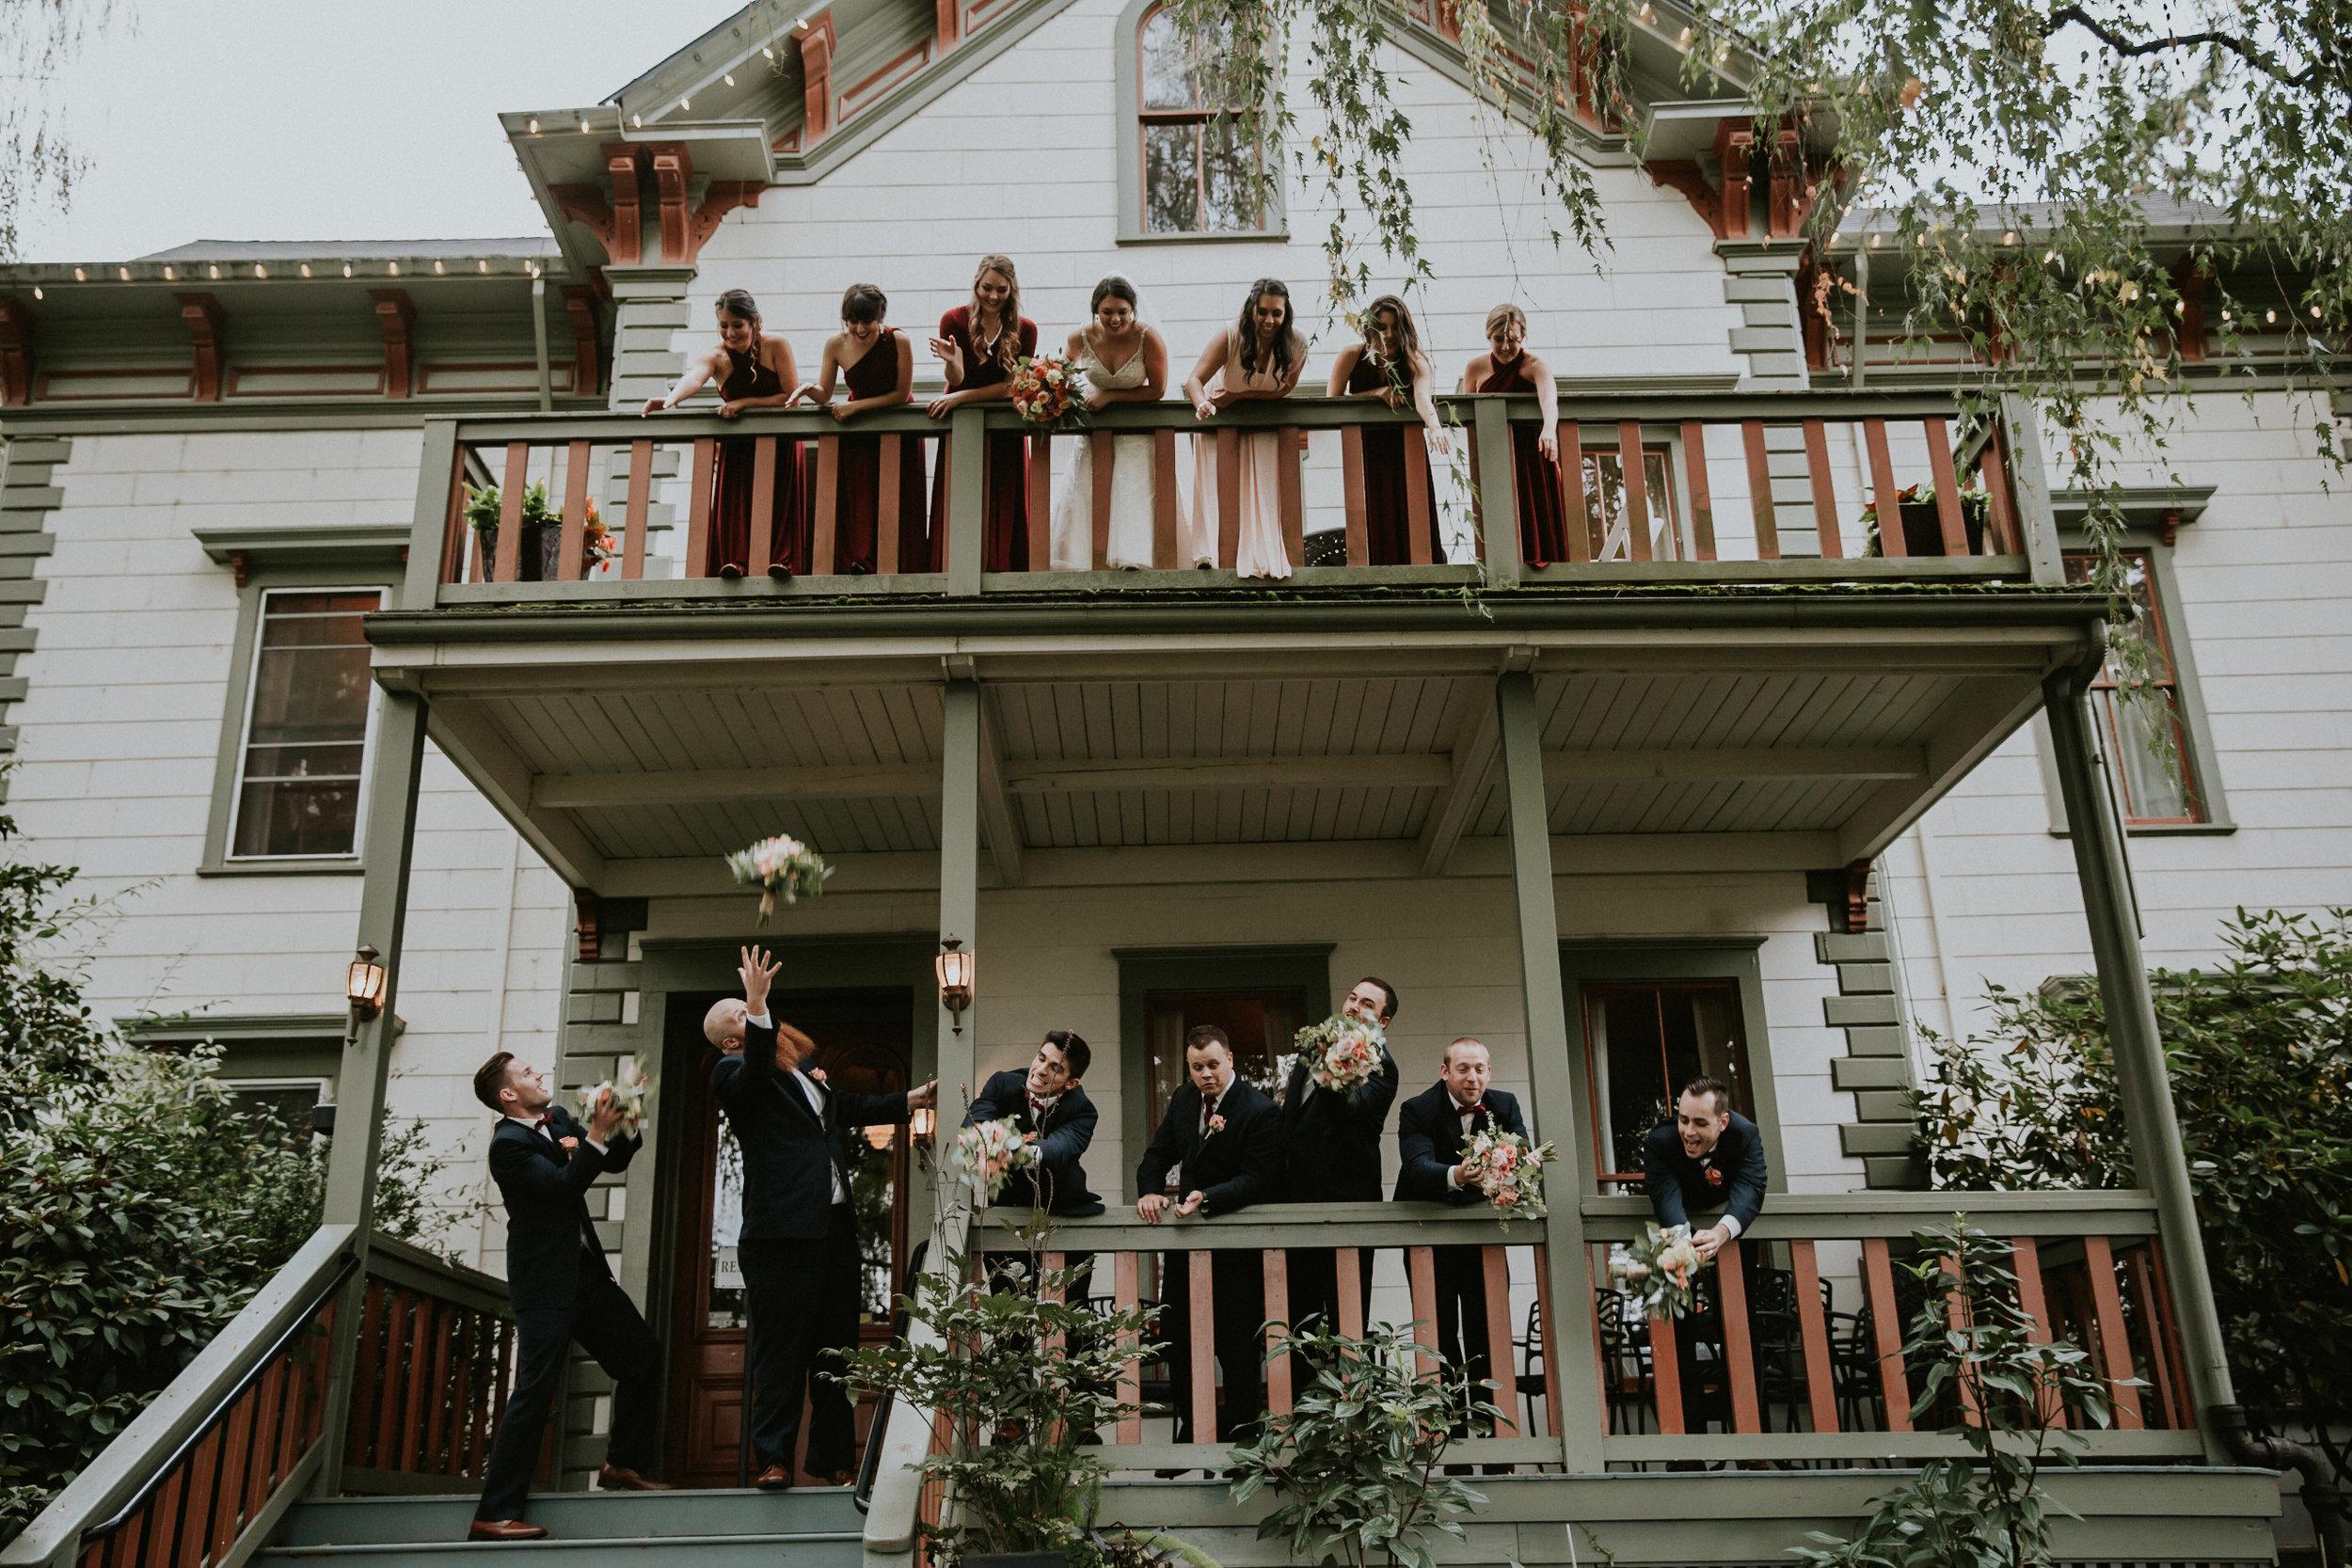 McMenamins_Cornelious_Pass_Roadhouse_wedding_photographer_AlfredTang-7.jpg